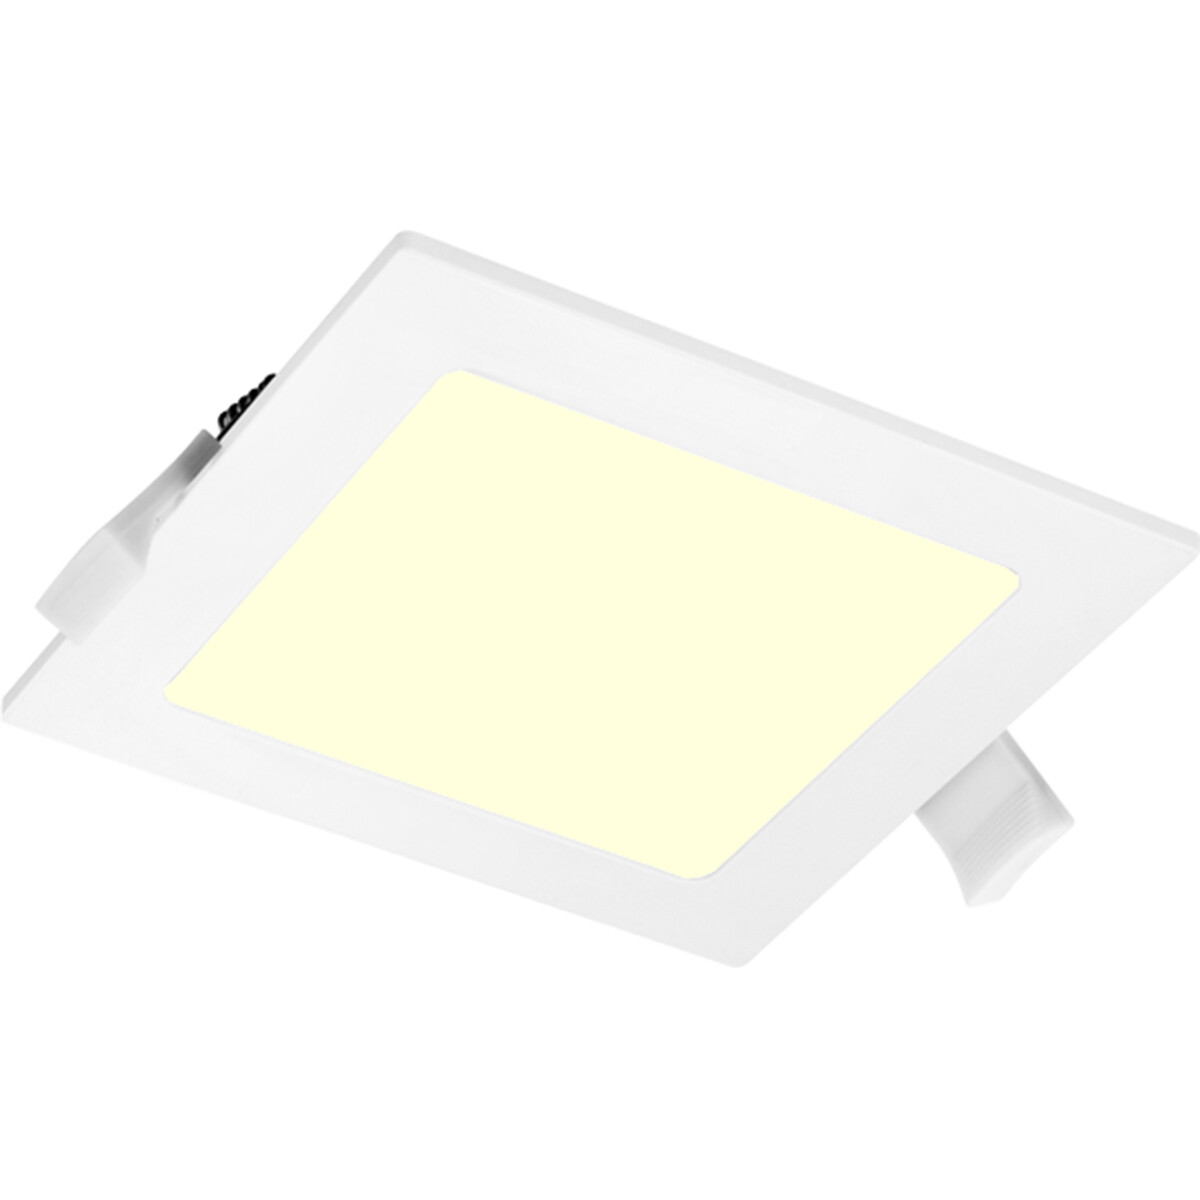 LED Downlight Slim Pro - Aigi Suno - Inbouw Vierkant 9W - Warm Wit 3000K - Mat Wit - Kunststof